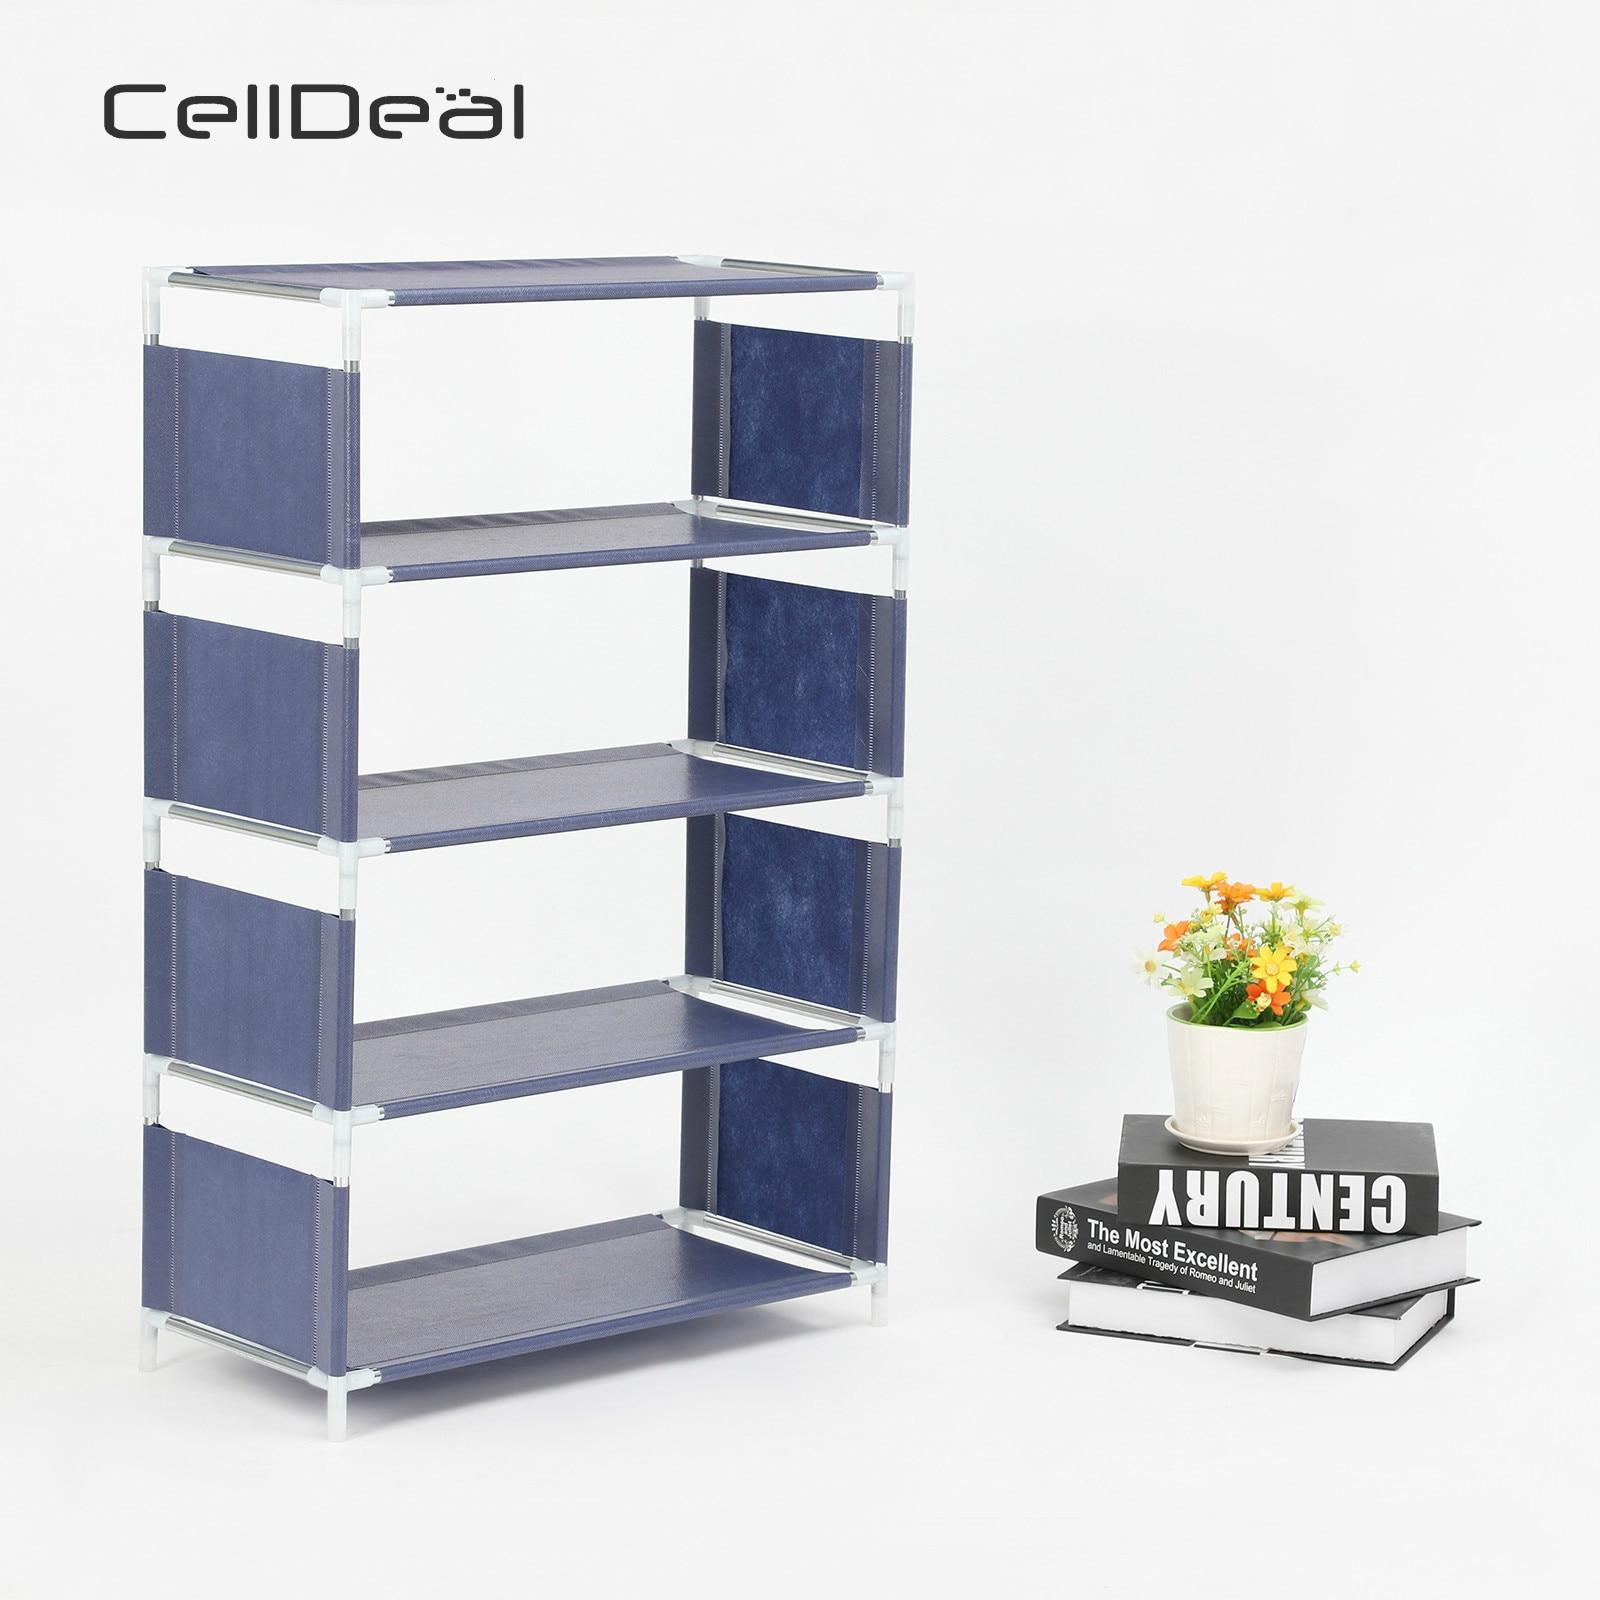 Shoe Rack Assemble Shoes Shelf Multi Functional Simple Hallway Cabinet Organizer Holder Storage Solid Stand Shelves Shoe Living